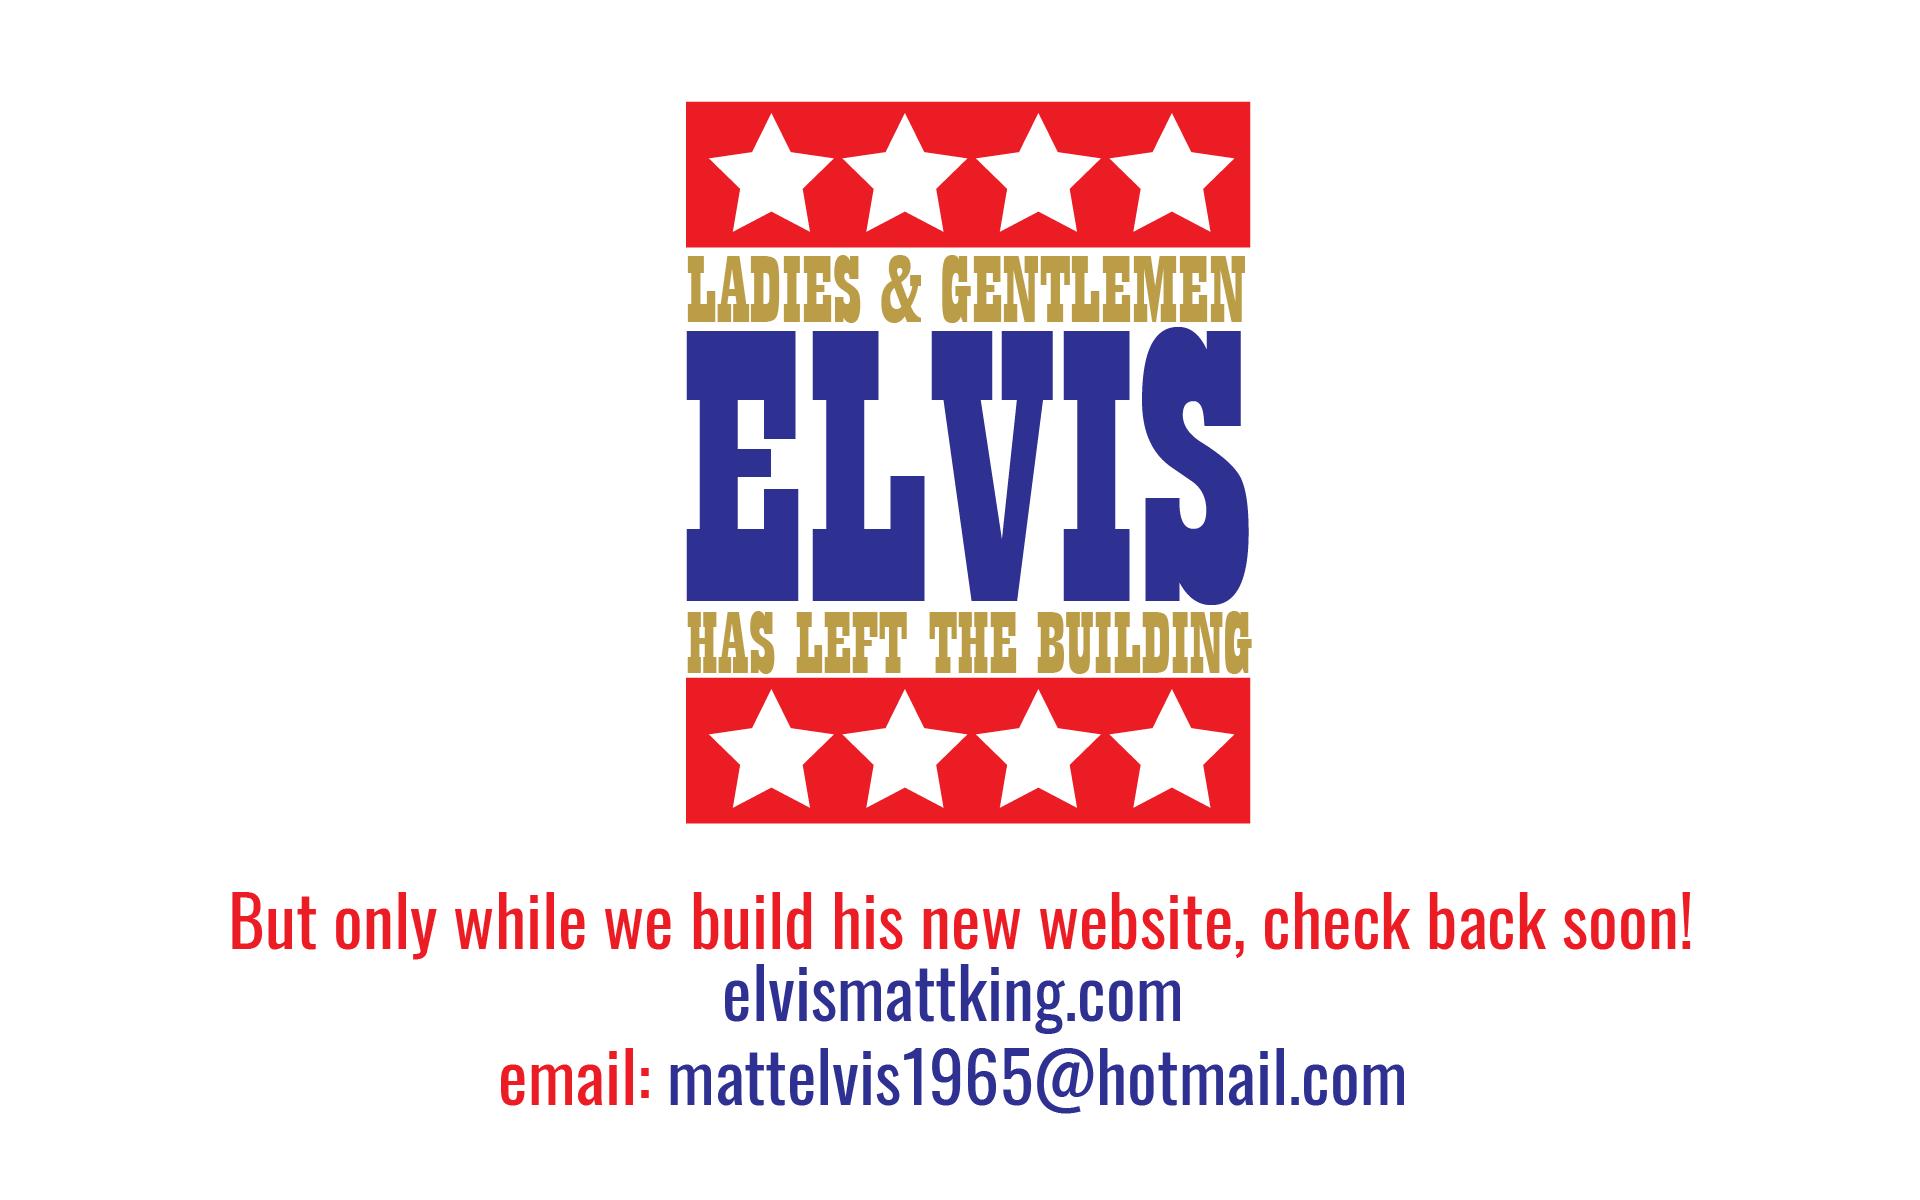 http://elvismattking.com/wp-content/uploads/2018/06/elvis-has-left-email_2.png